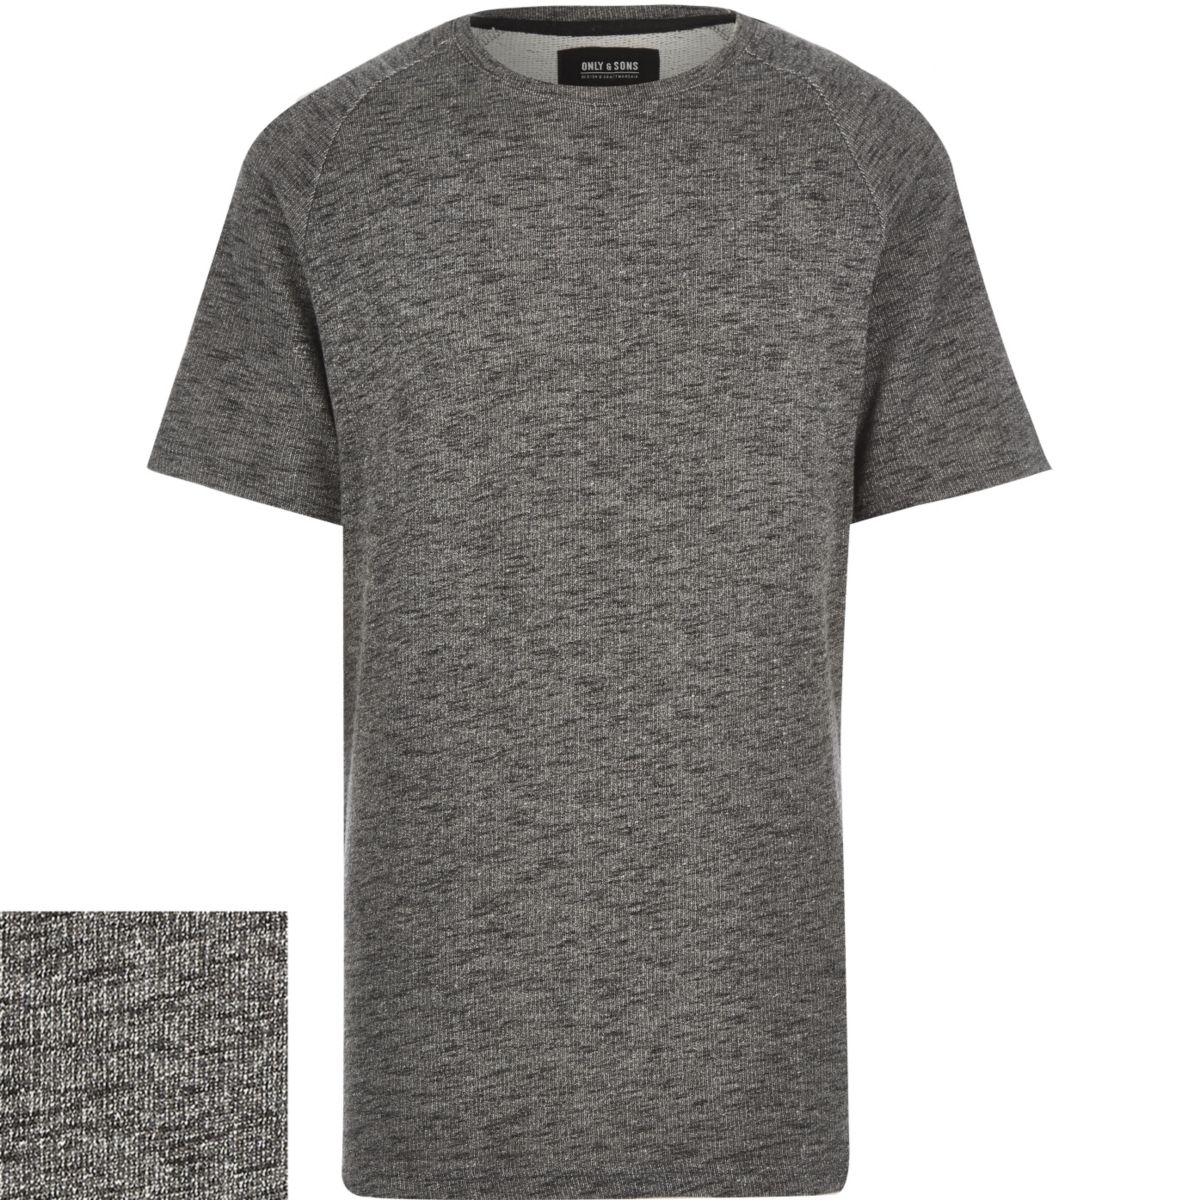 Grey Only & Sons dark grey sweatshirt